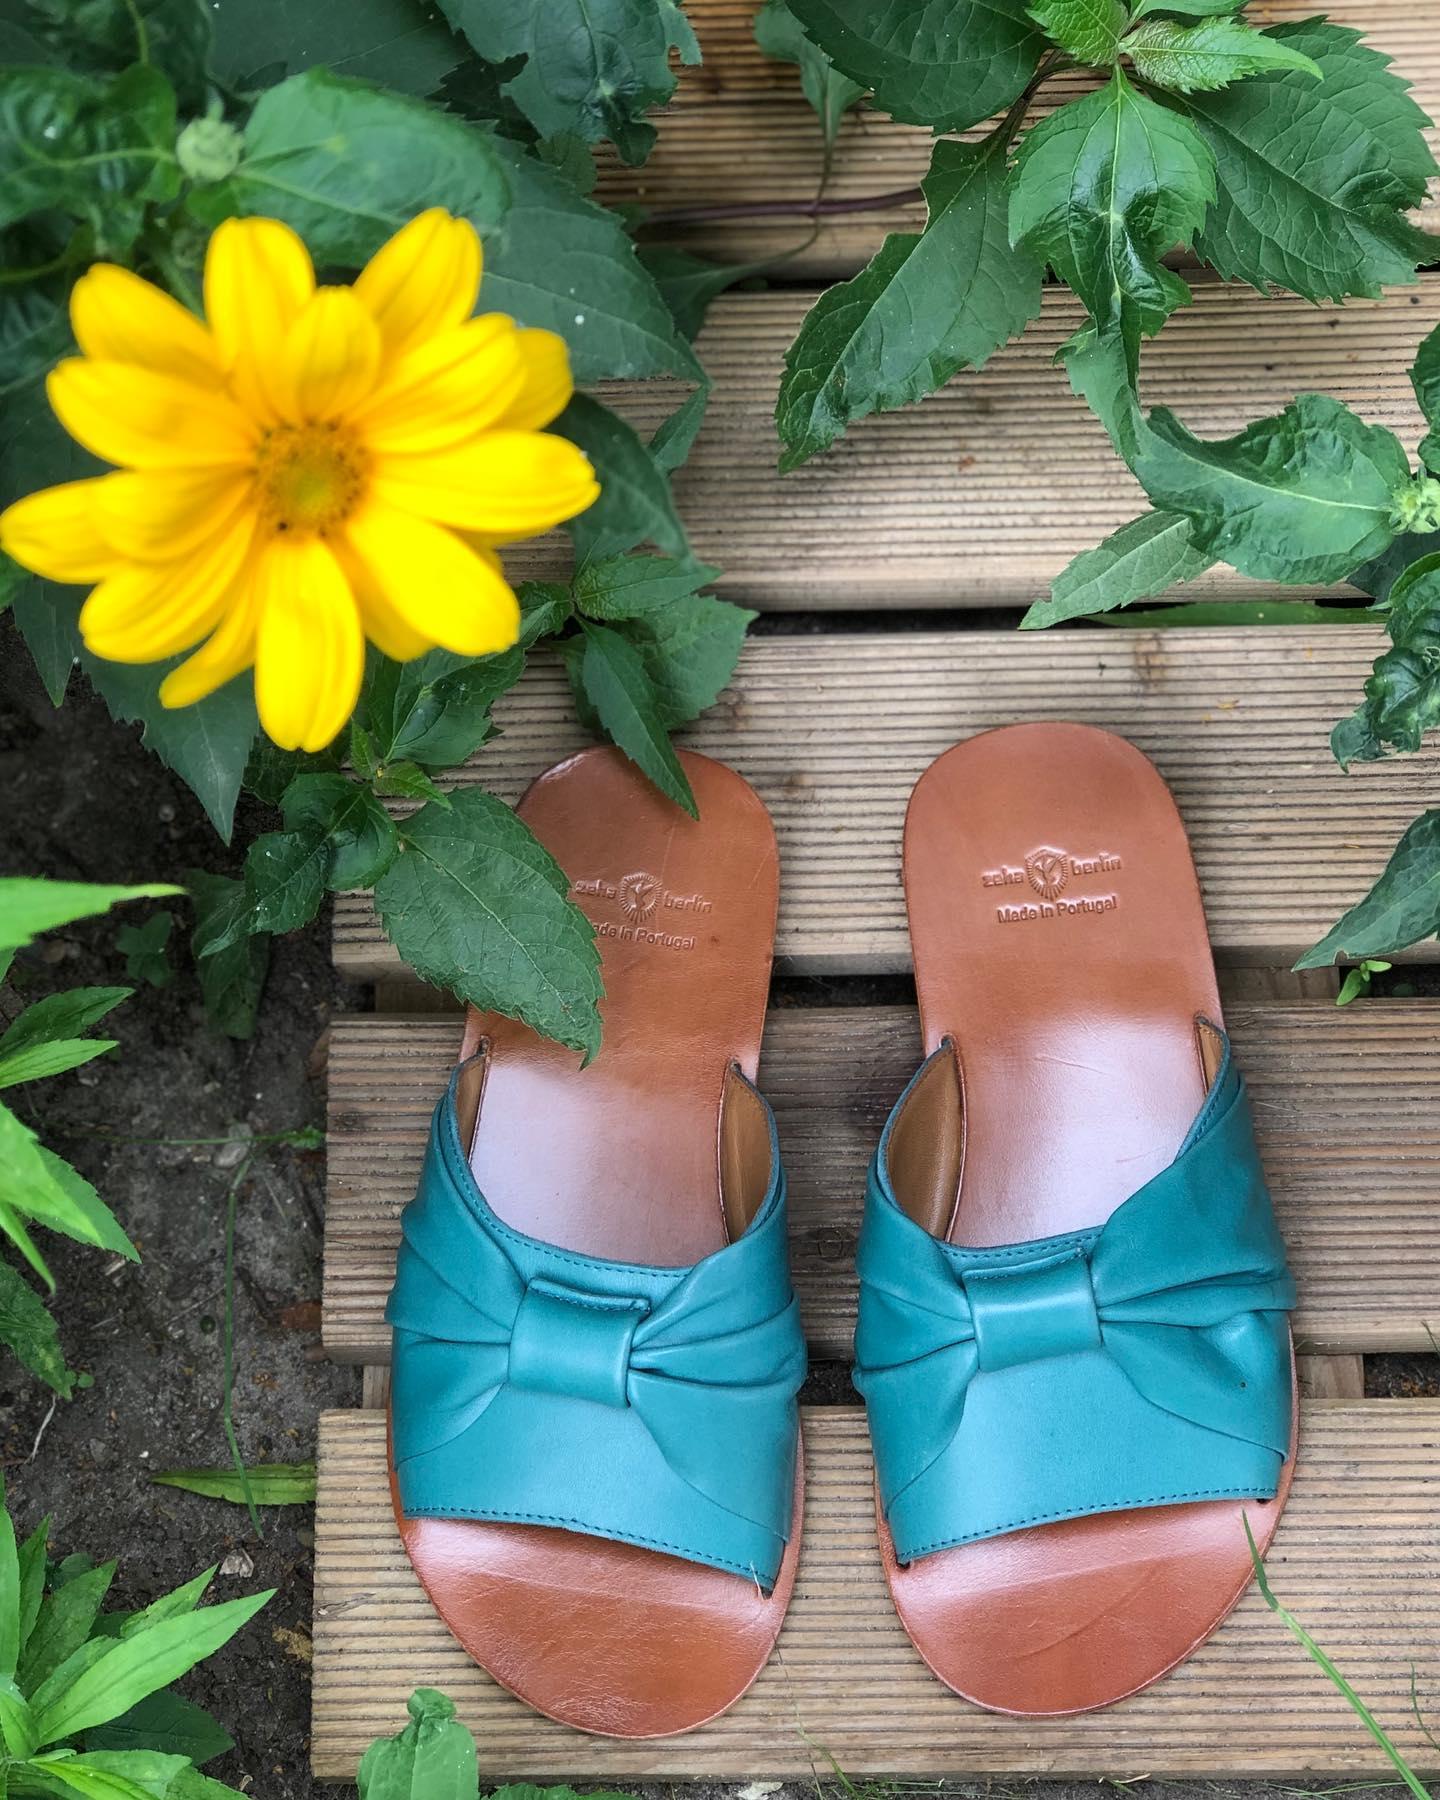 Damen Sandalern aus Leder Zeha Berlin Summer 2020